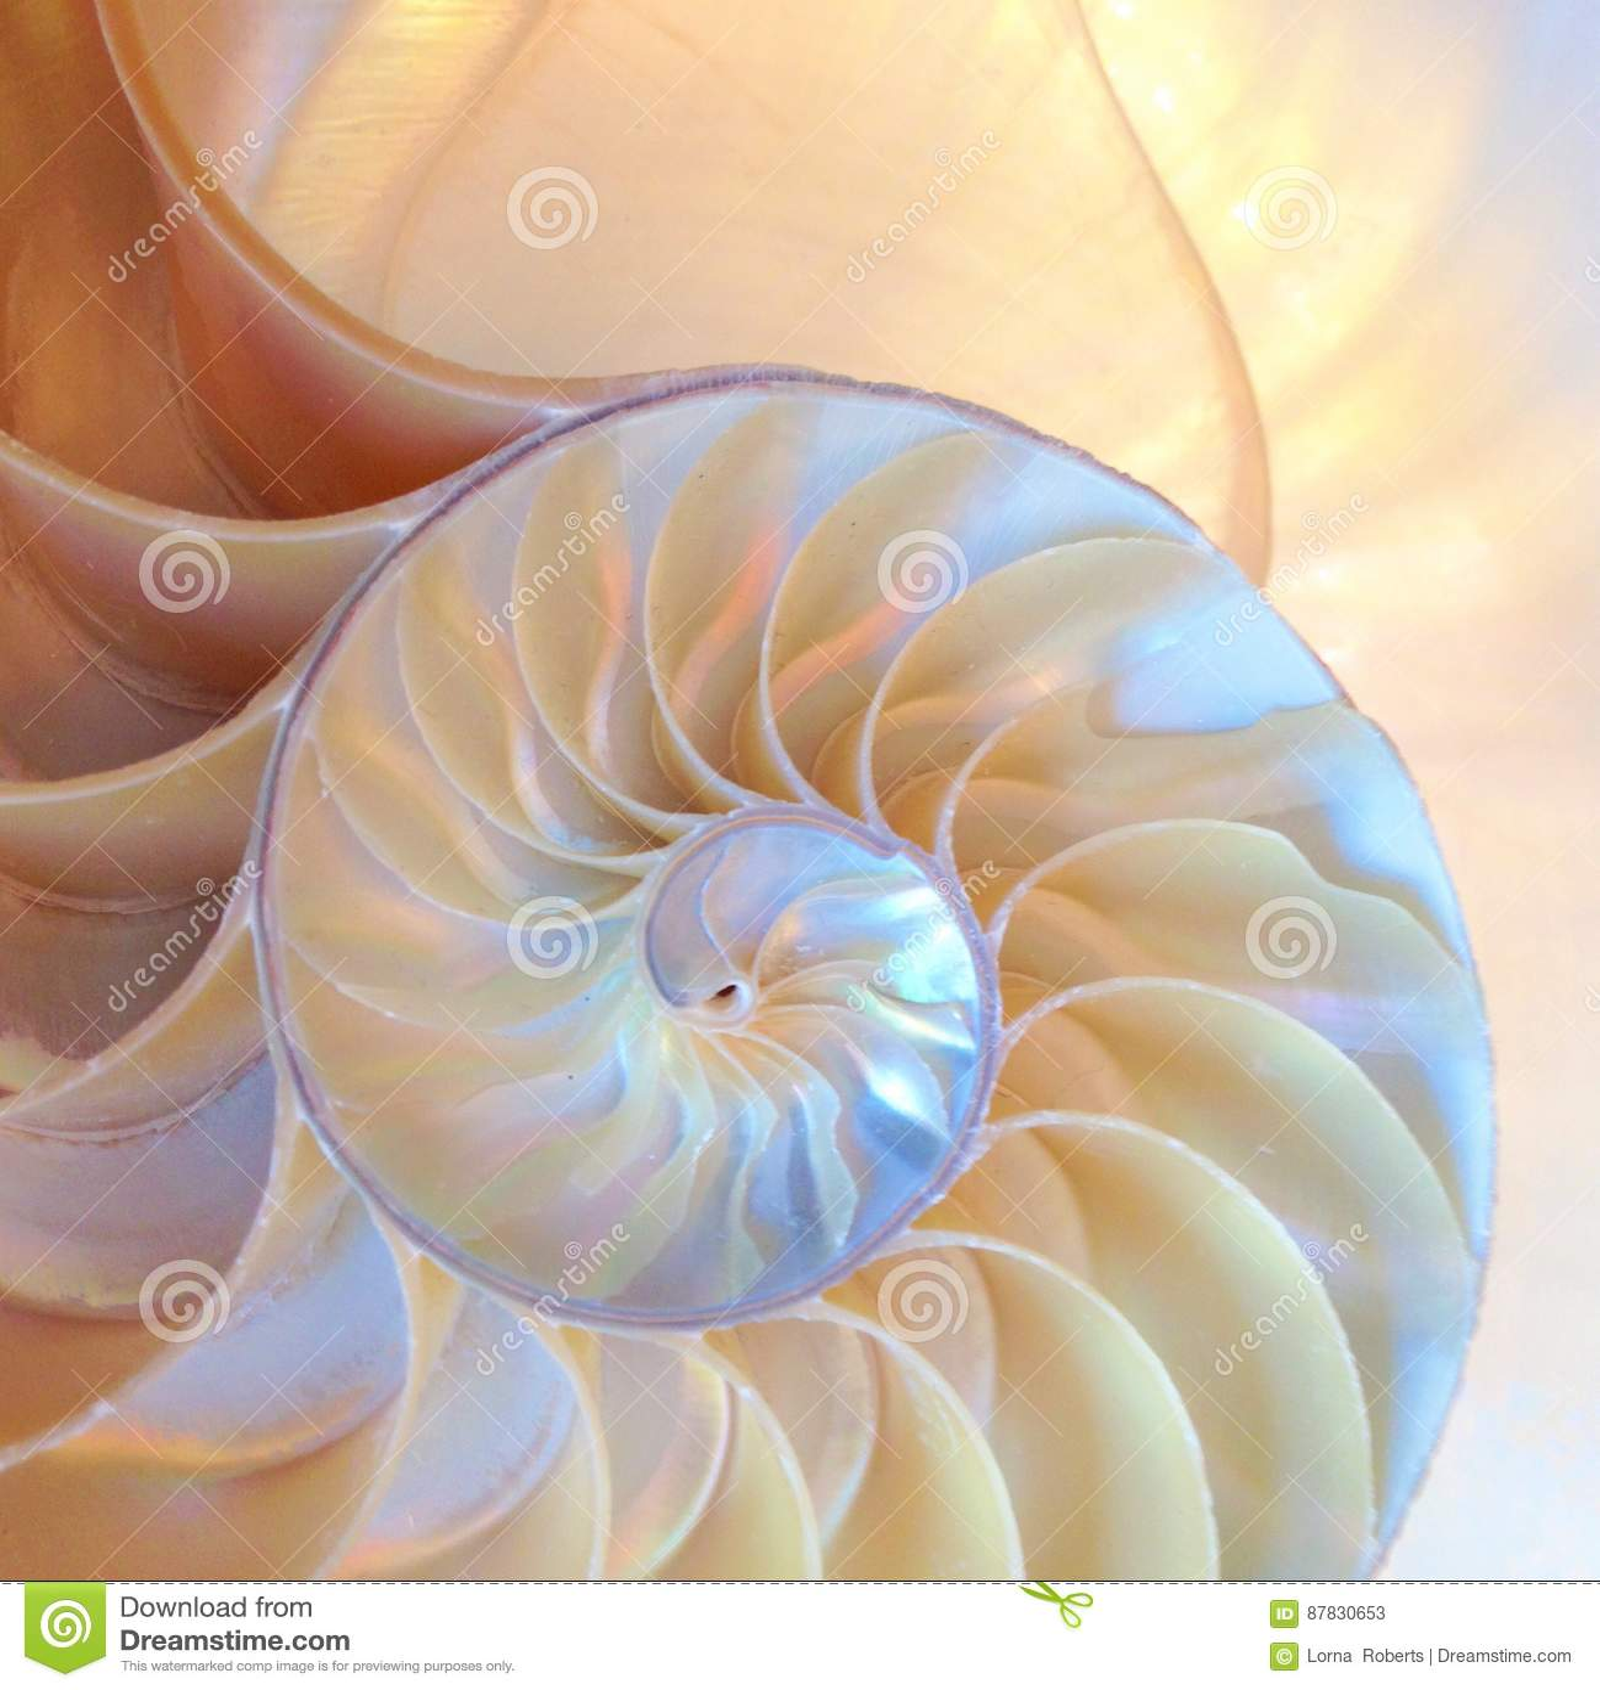 Nautilus κοχυλιών συμμετρίας σπειροειδής χρυσή αναλογία στενή επάνω πίσω αναμμένη μητέρα διατομής του Φιμπονάτσι μισή αύξησης δομ